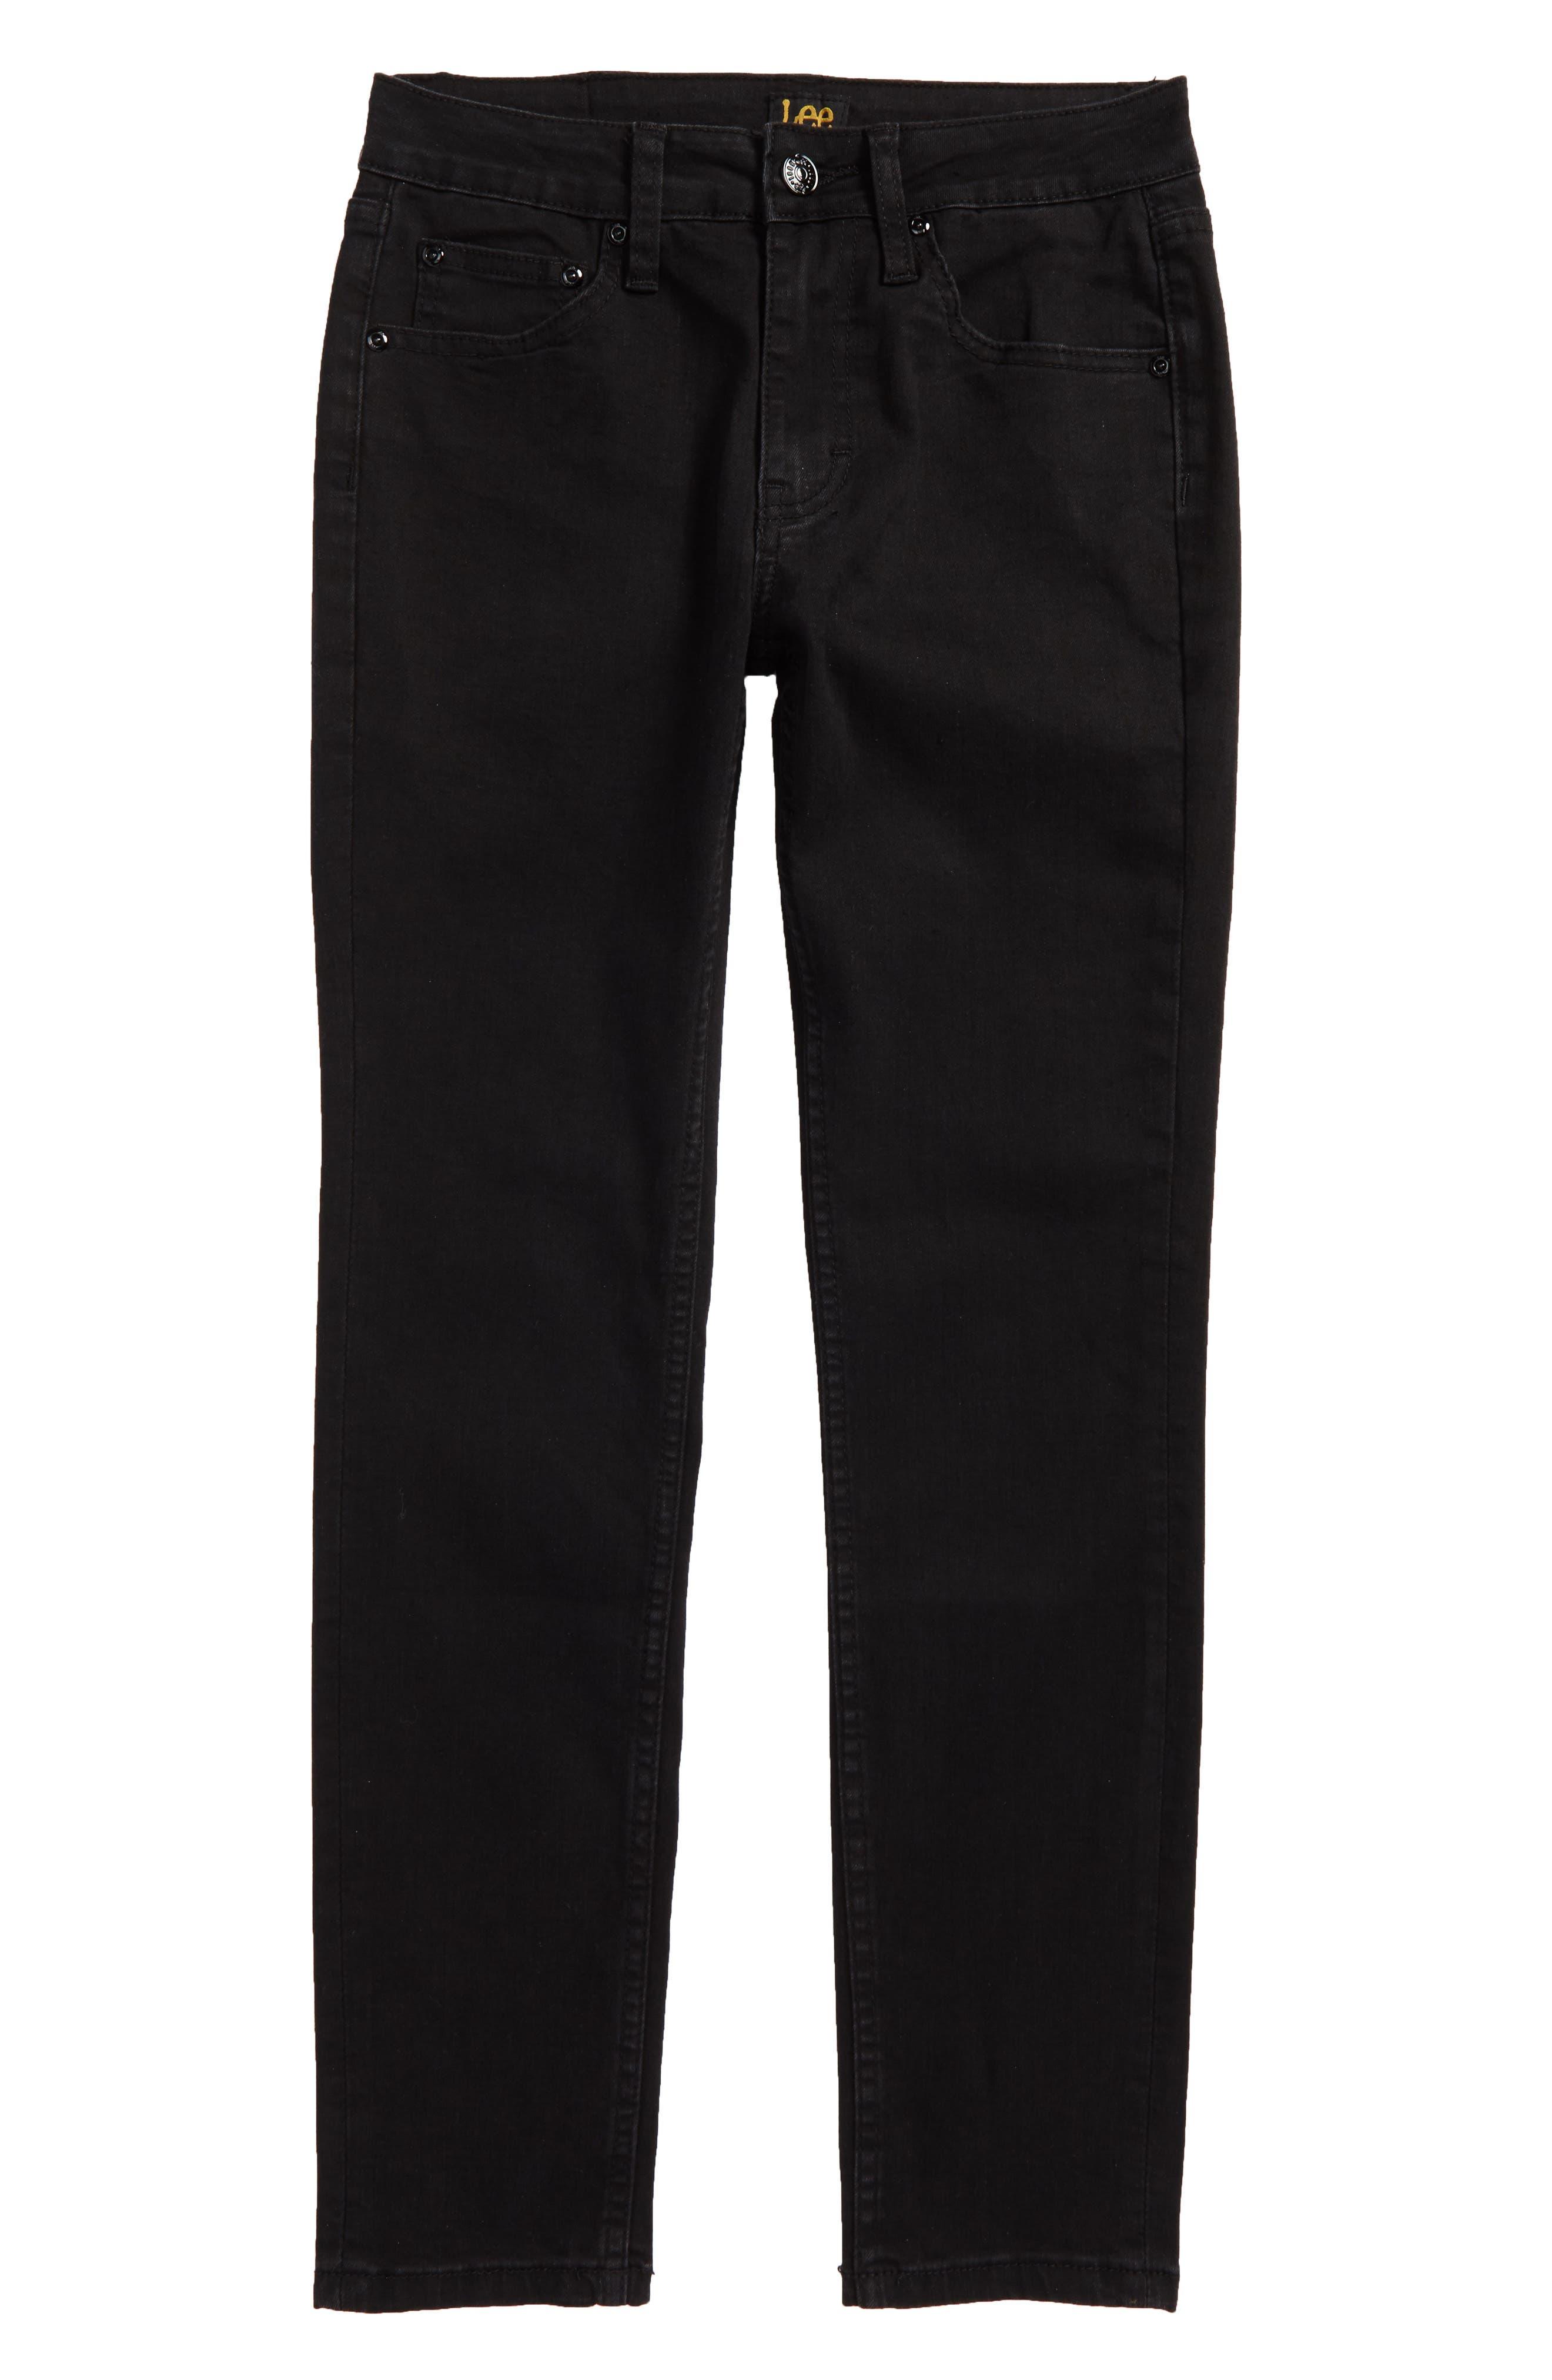 Stretch Skinny Jeans,                         Main,                         color, Jet